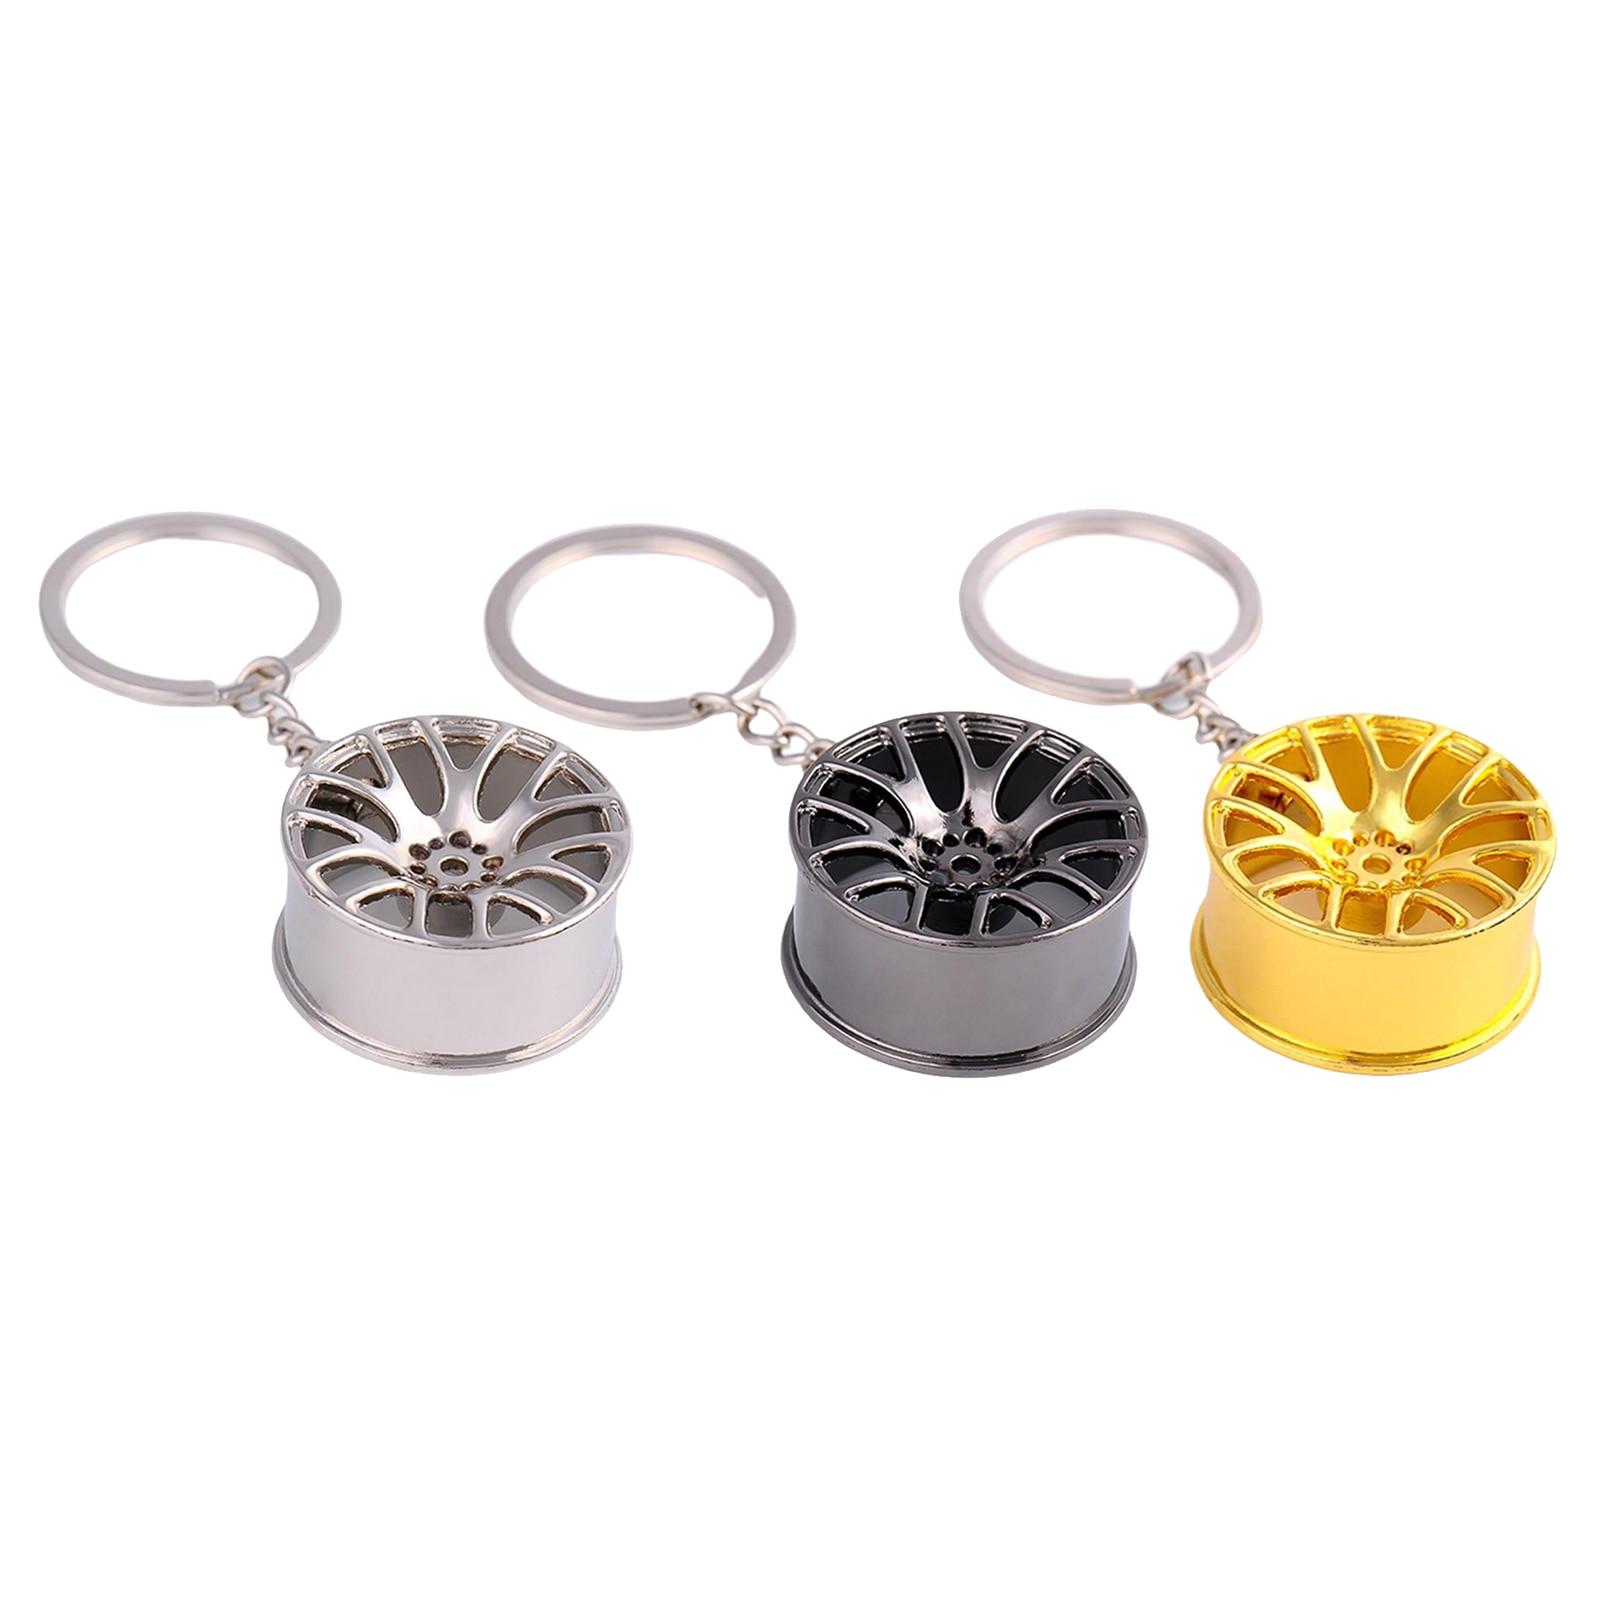 Fashion Creative Metal Wheel Rim Keychain Auto Car Handbag Bag Wheel Hubs Keyring Hanging Decor Ornament Gift